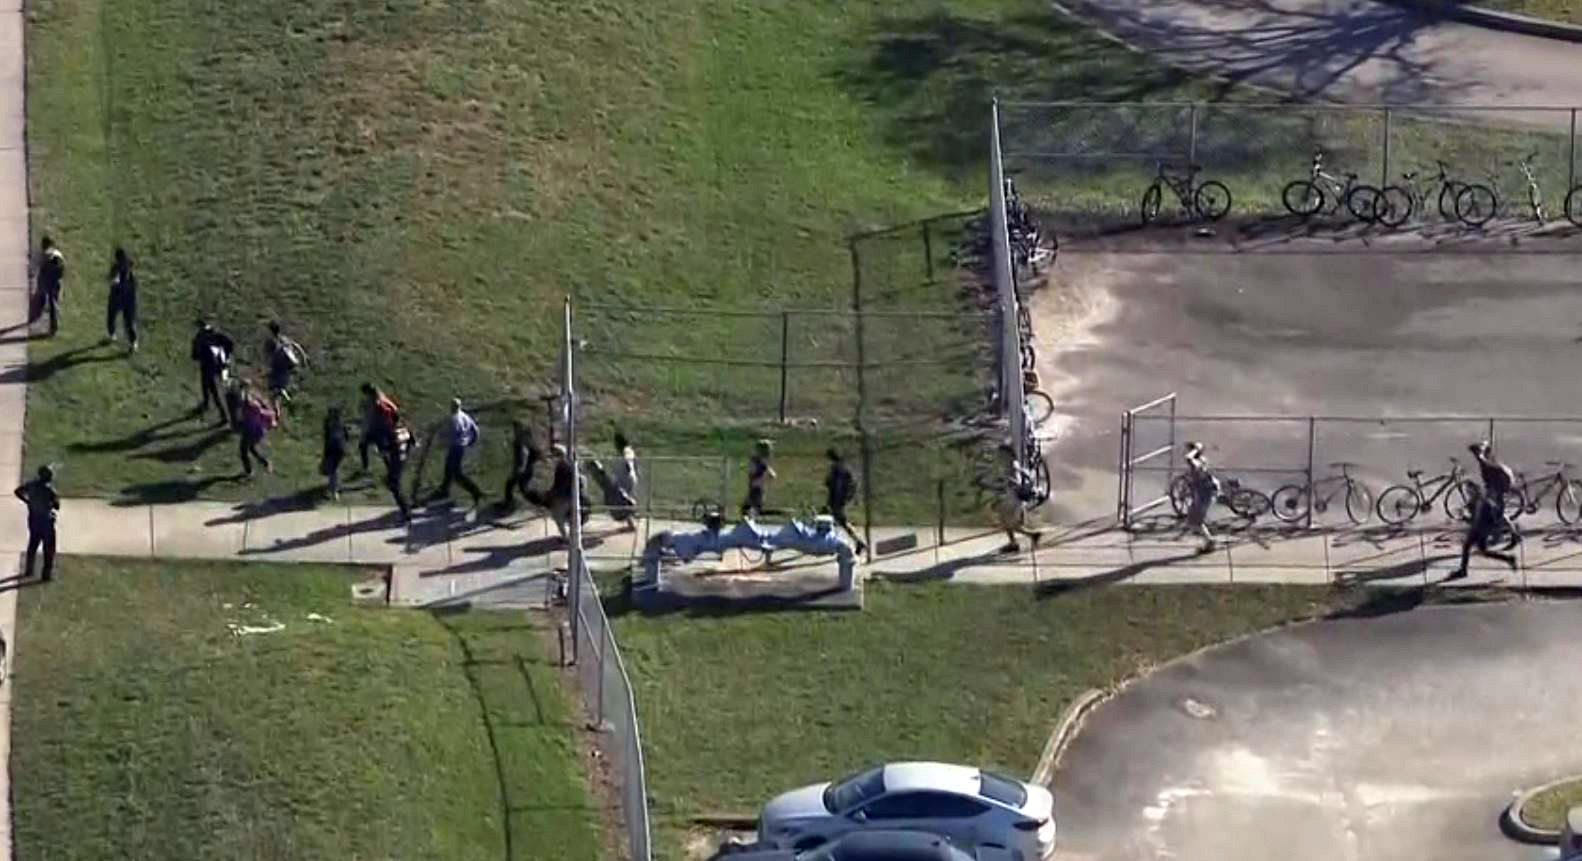 Students evacuating Marjory Stoneman Douglas High School on Feb. 14, 2018. (NBC Photo)